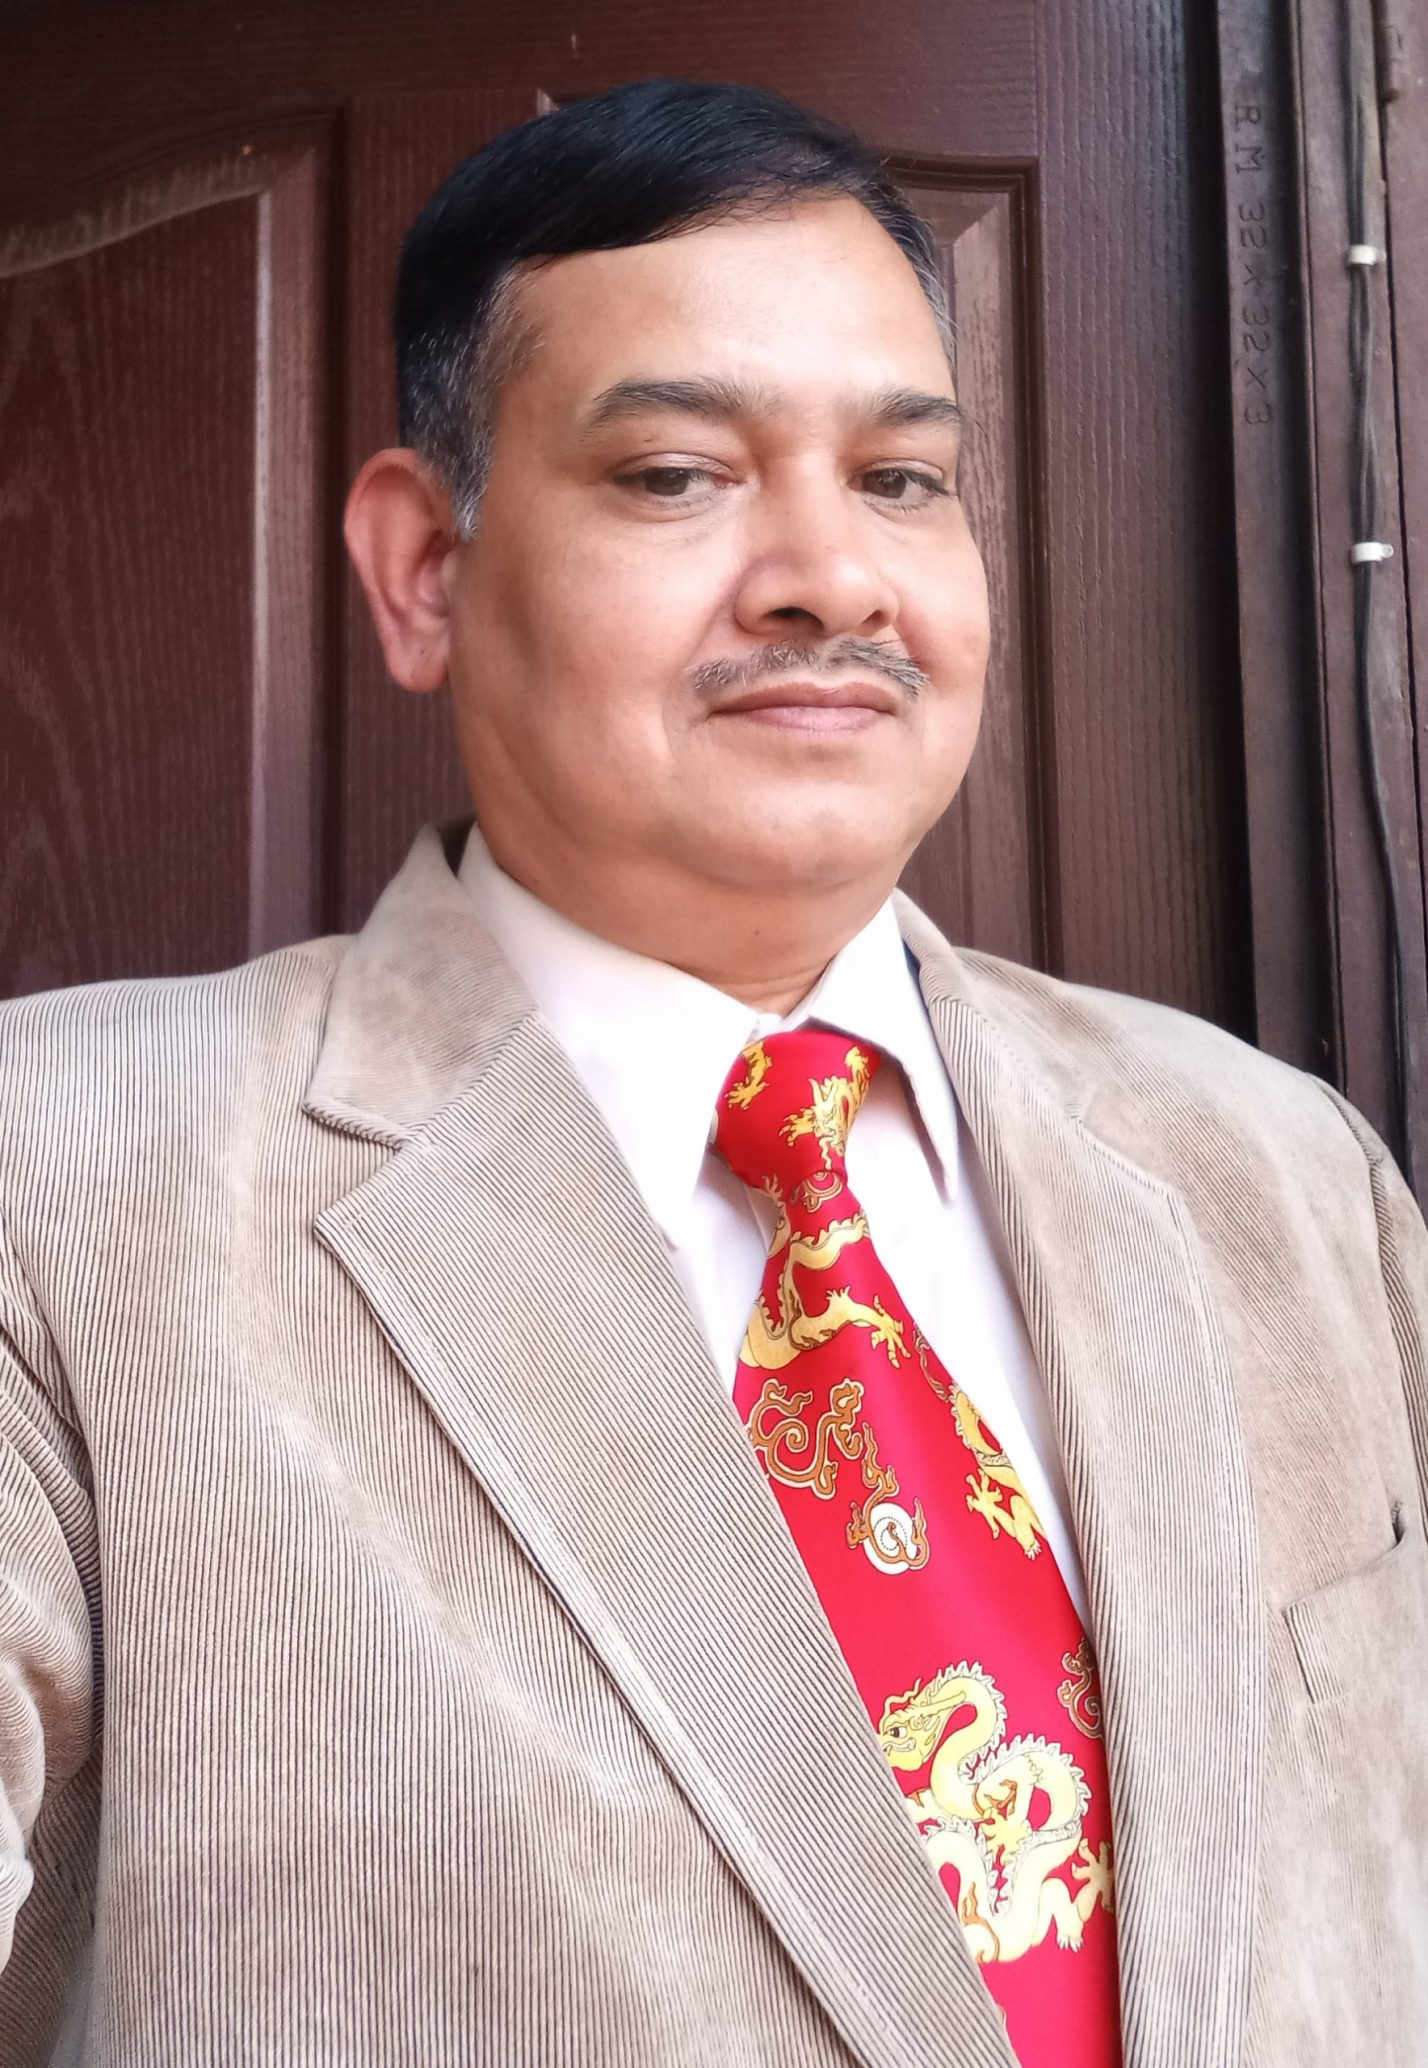 Kamlesh Kumar Agnihotri